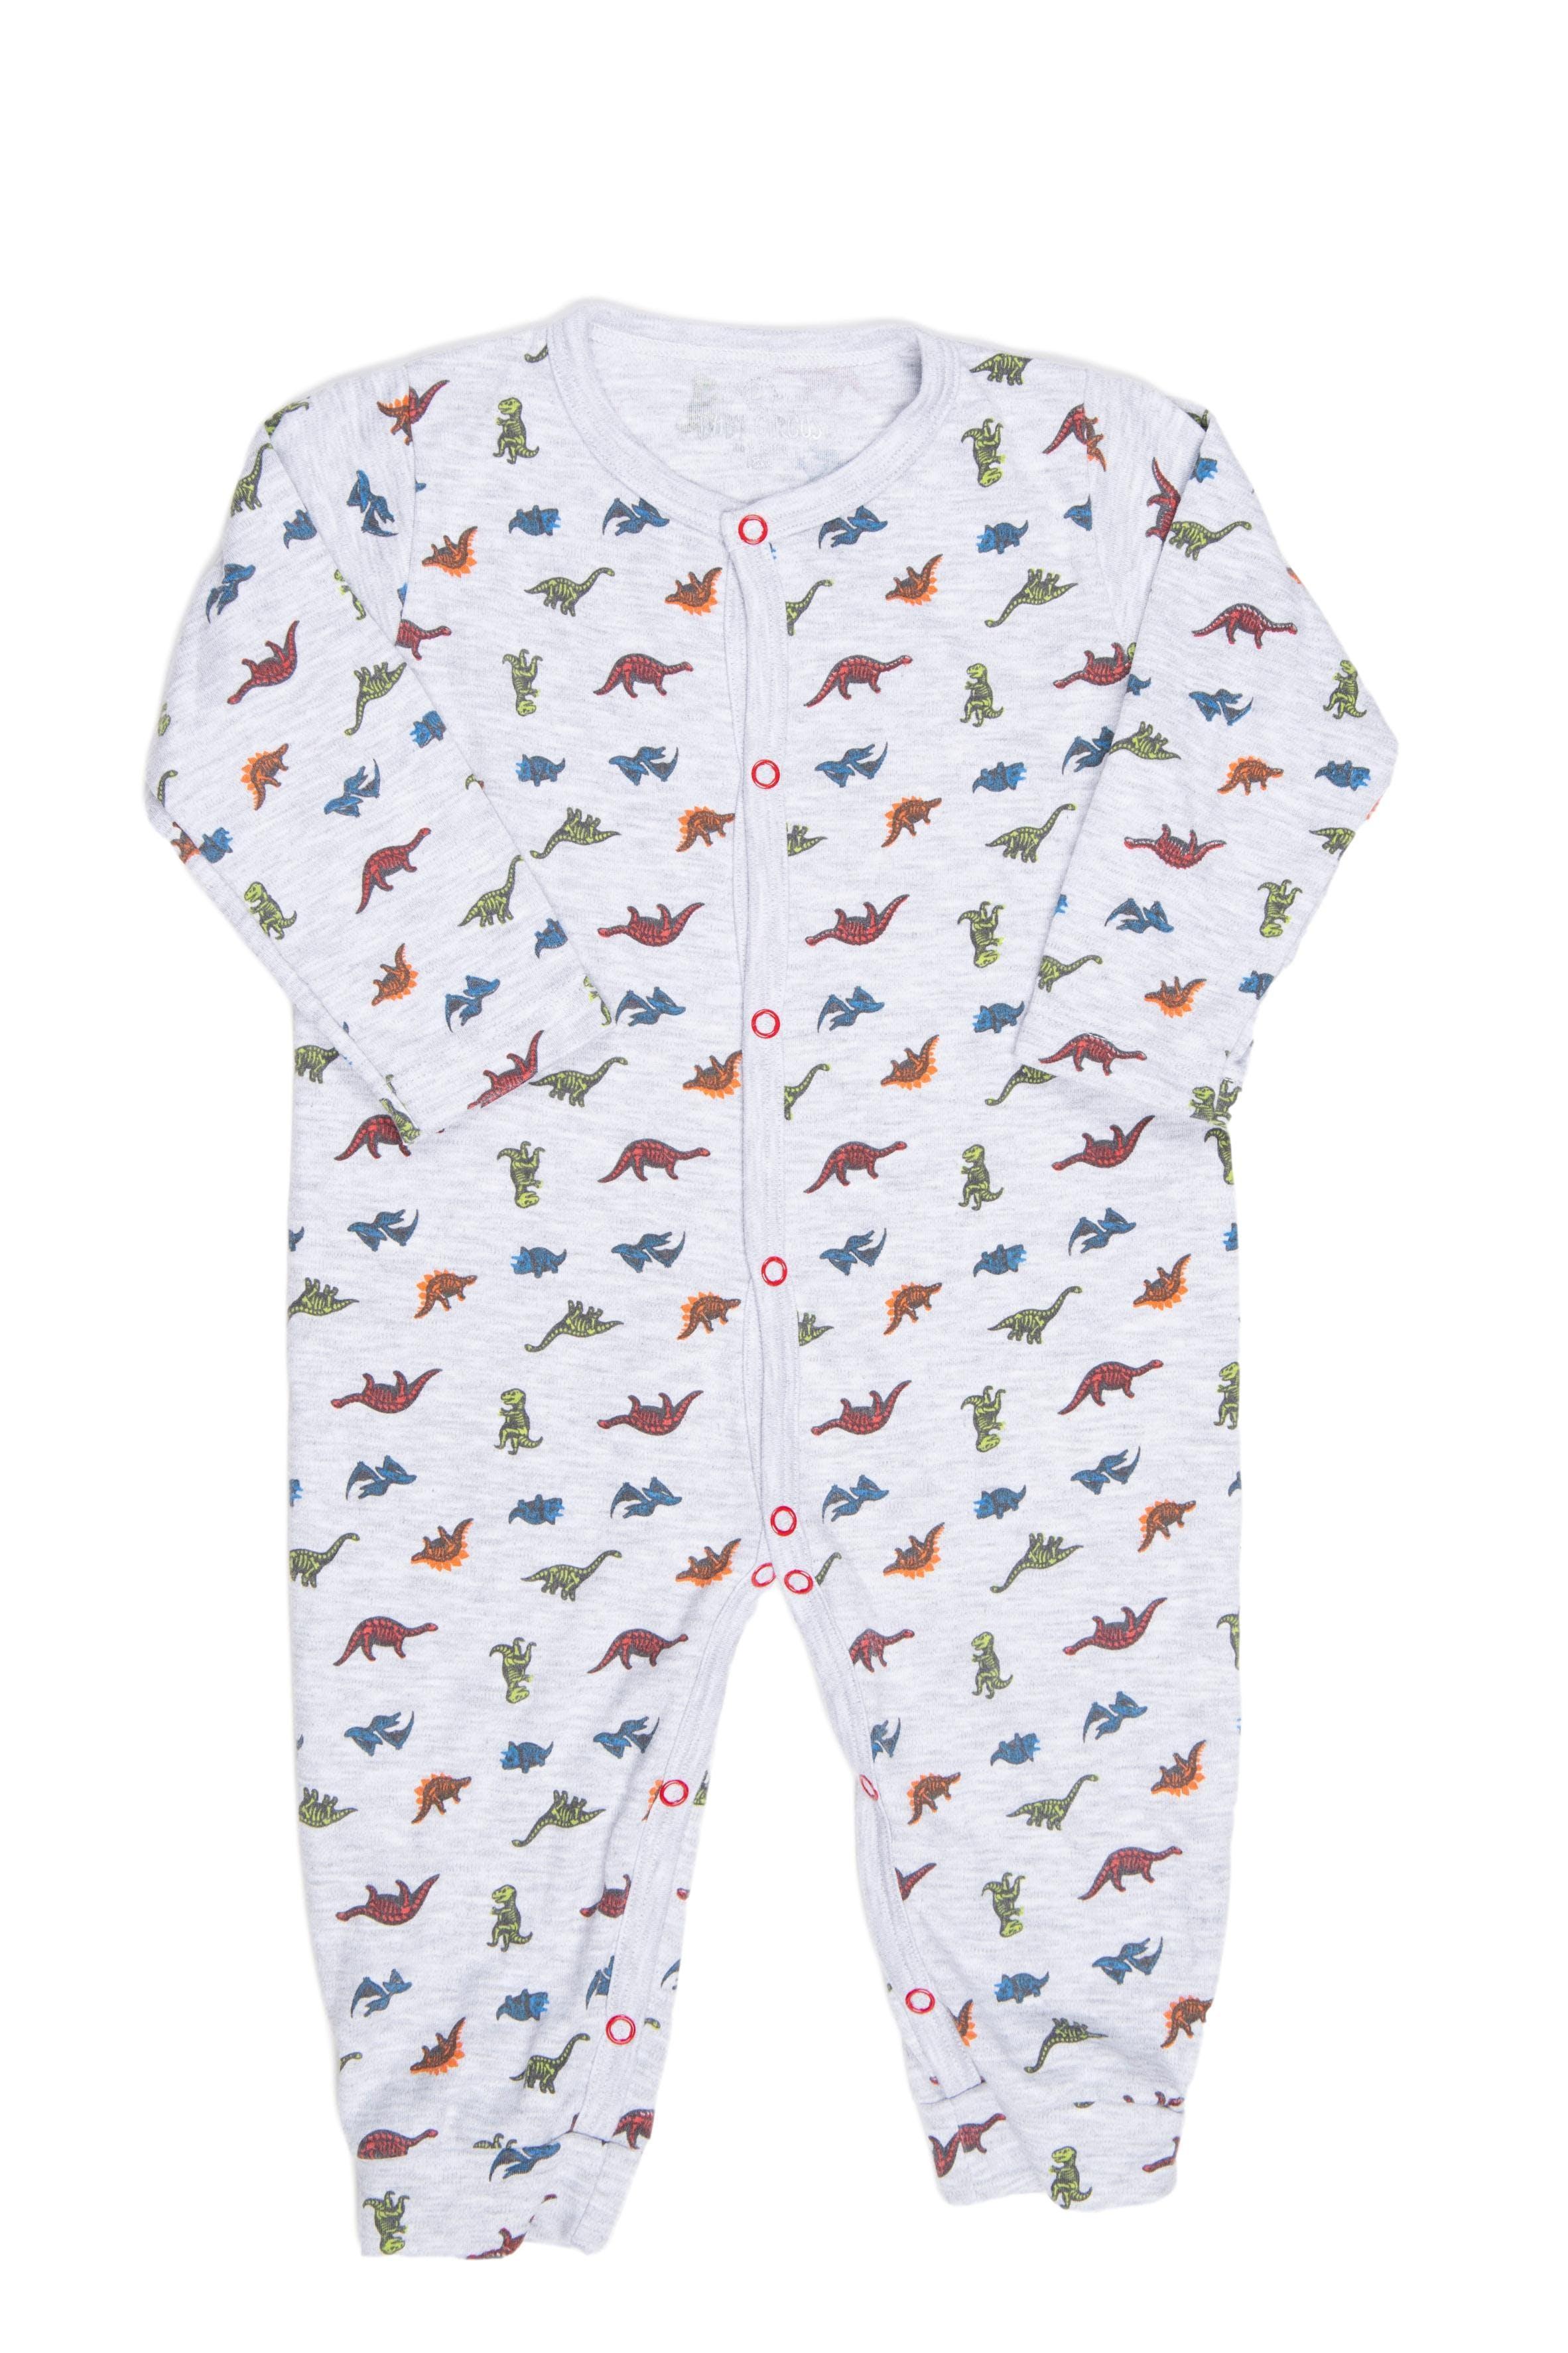 Enterizo sin pie gris con dinosaurios de colores, 100% algodón - Circus